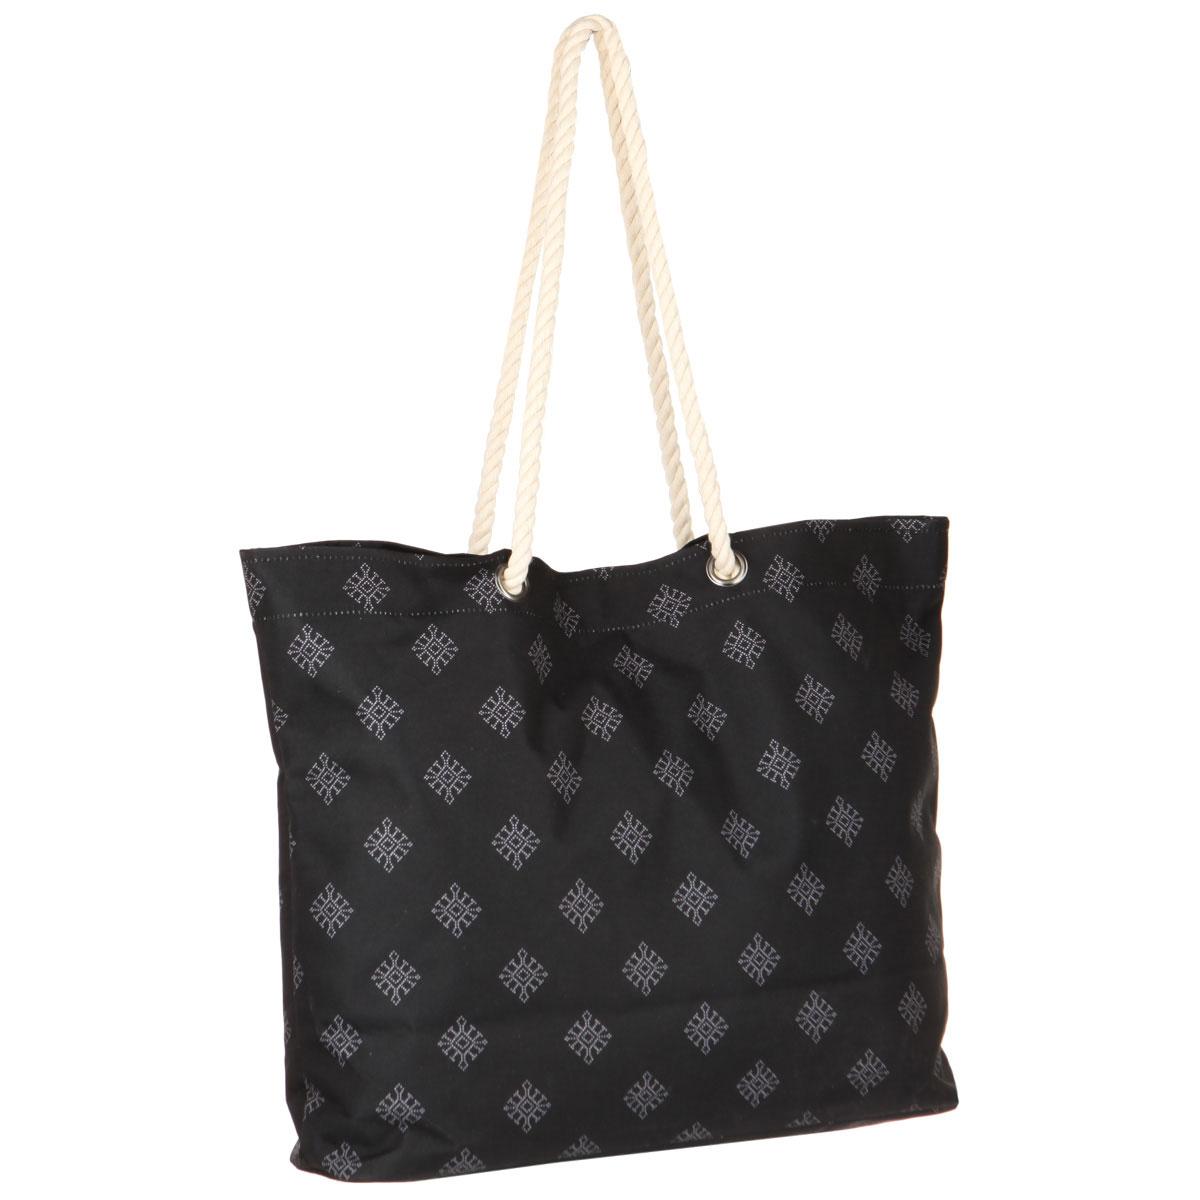 61da85266510 Купить сумку женскую Roxy Tropical Vibe Anthracite Pearly Ti ...